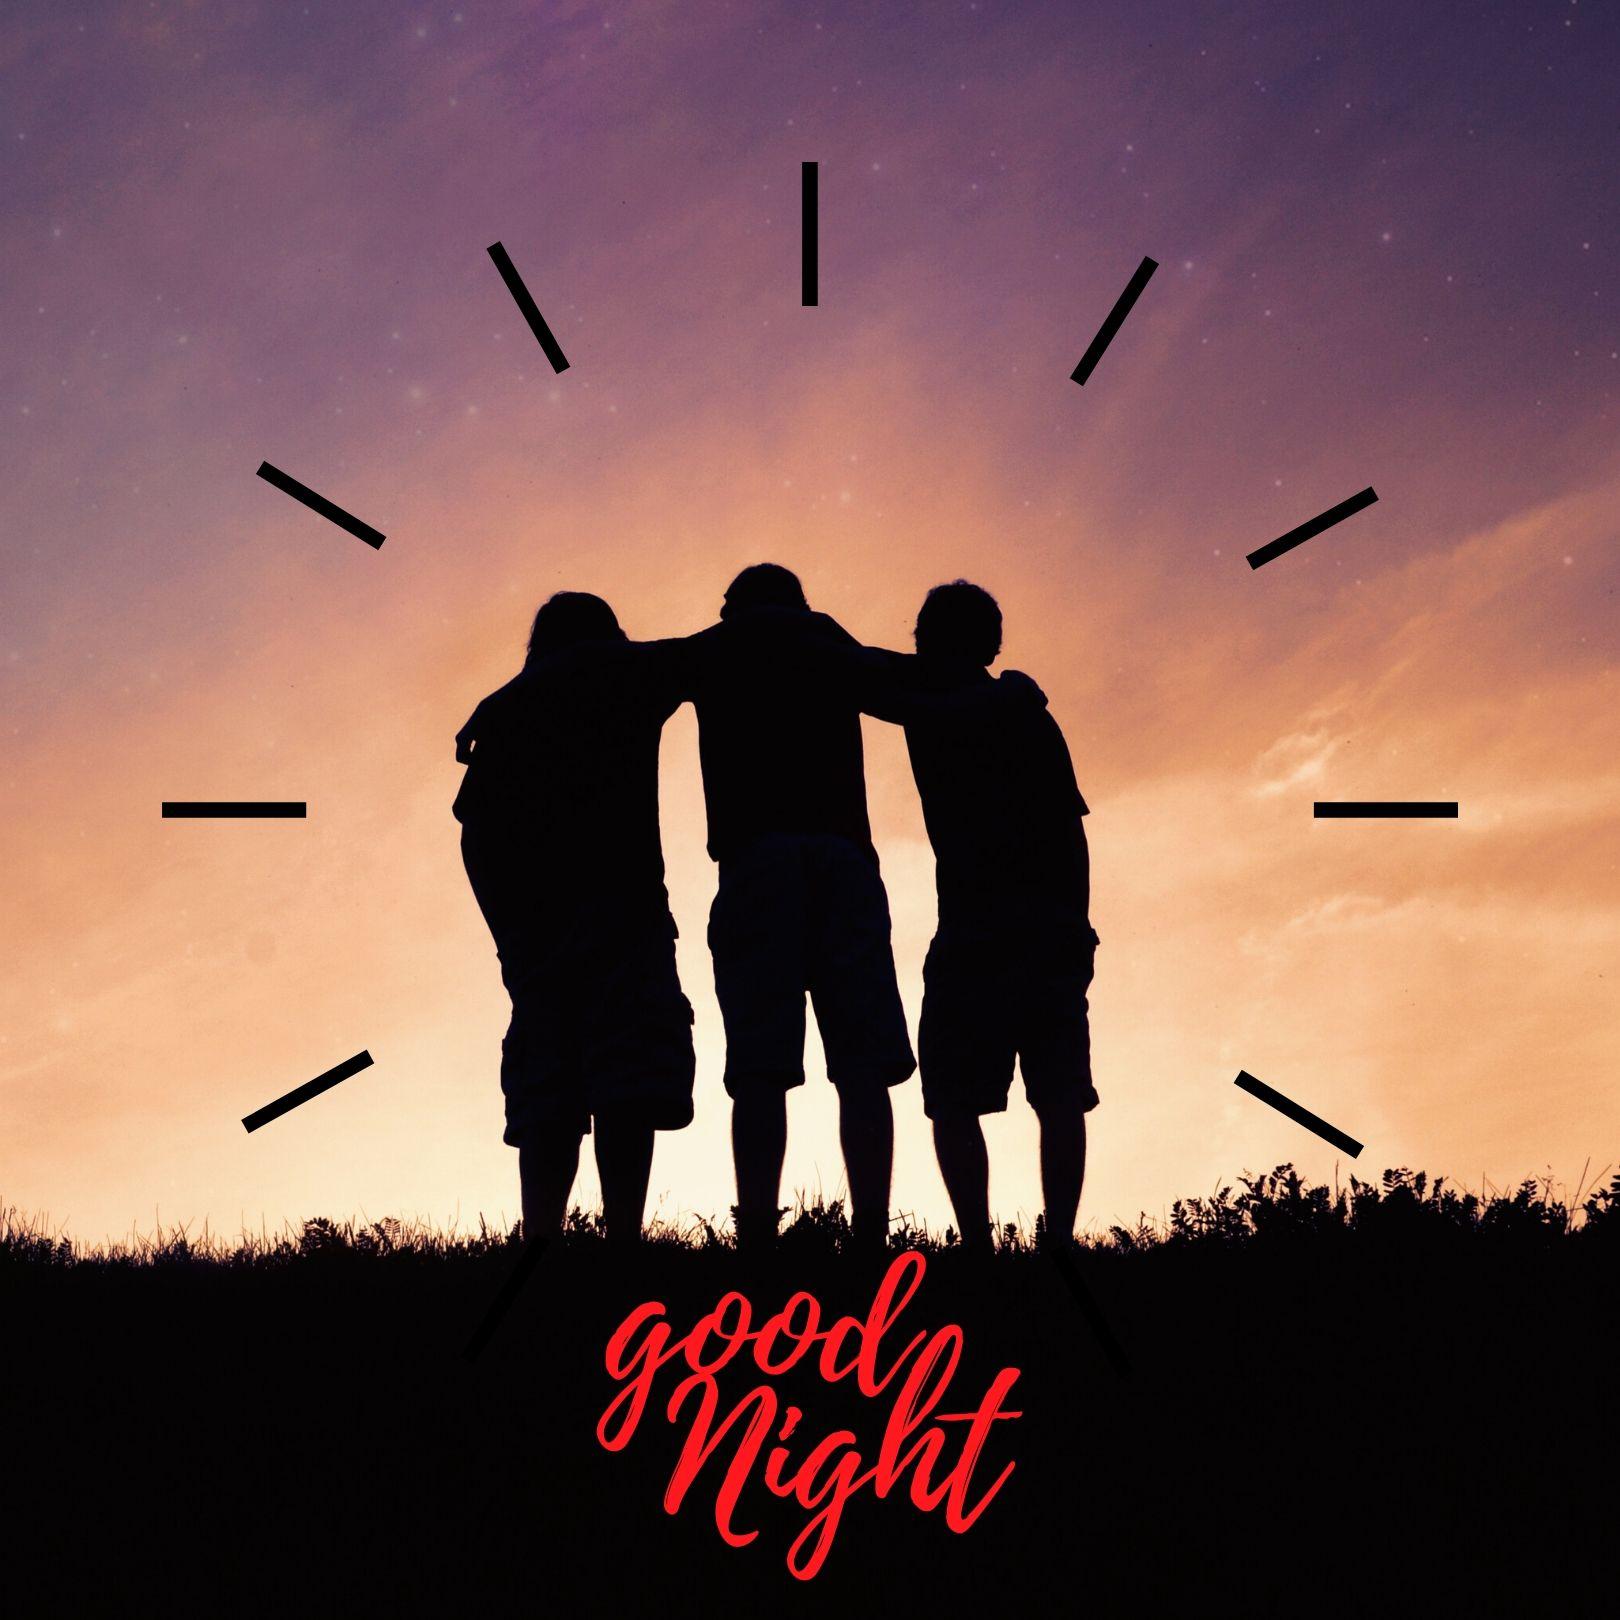 Good Night friend image full HD free download.